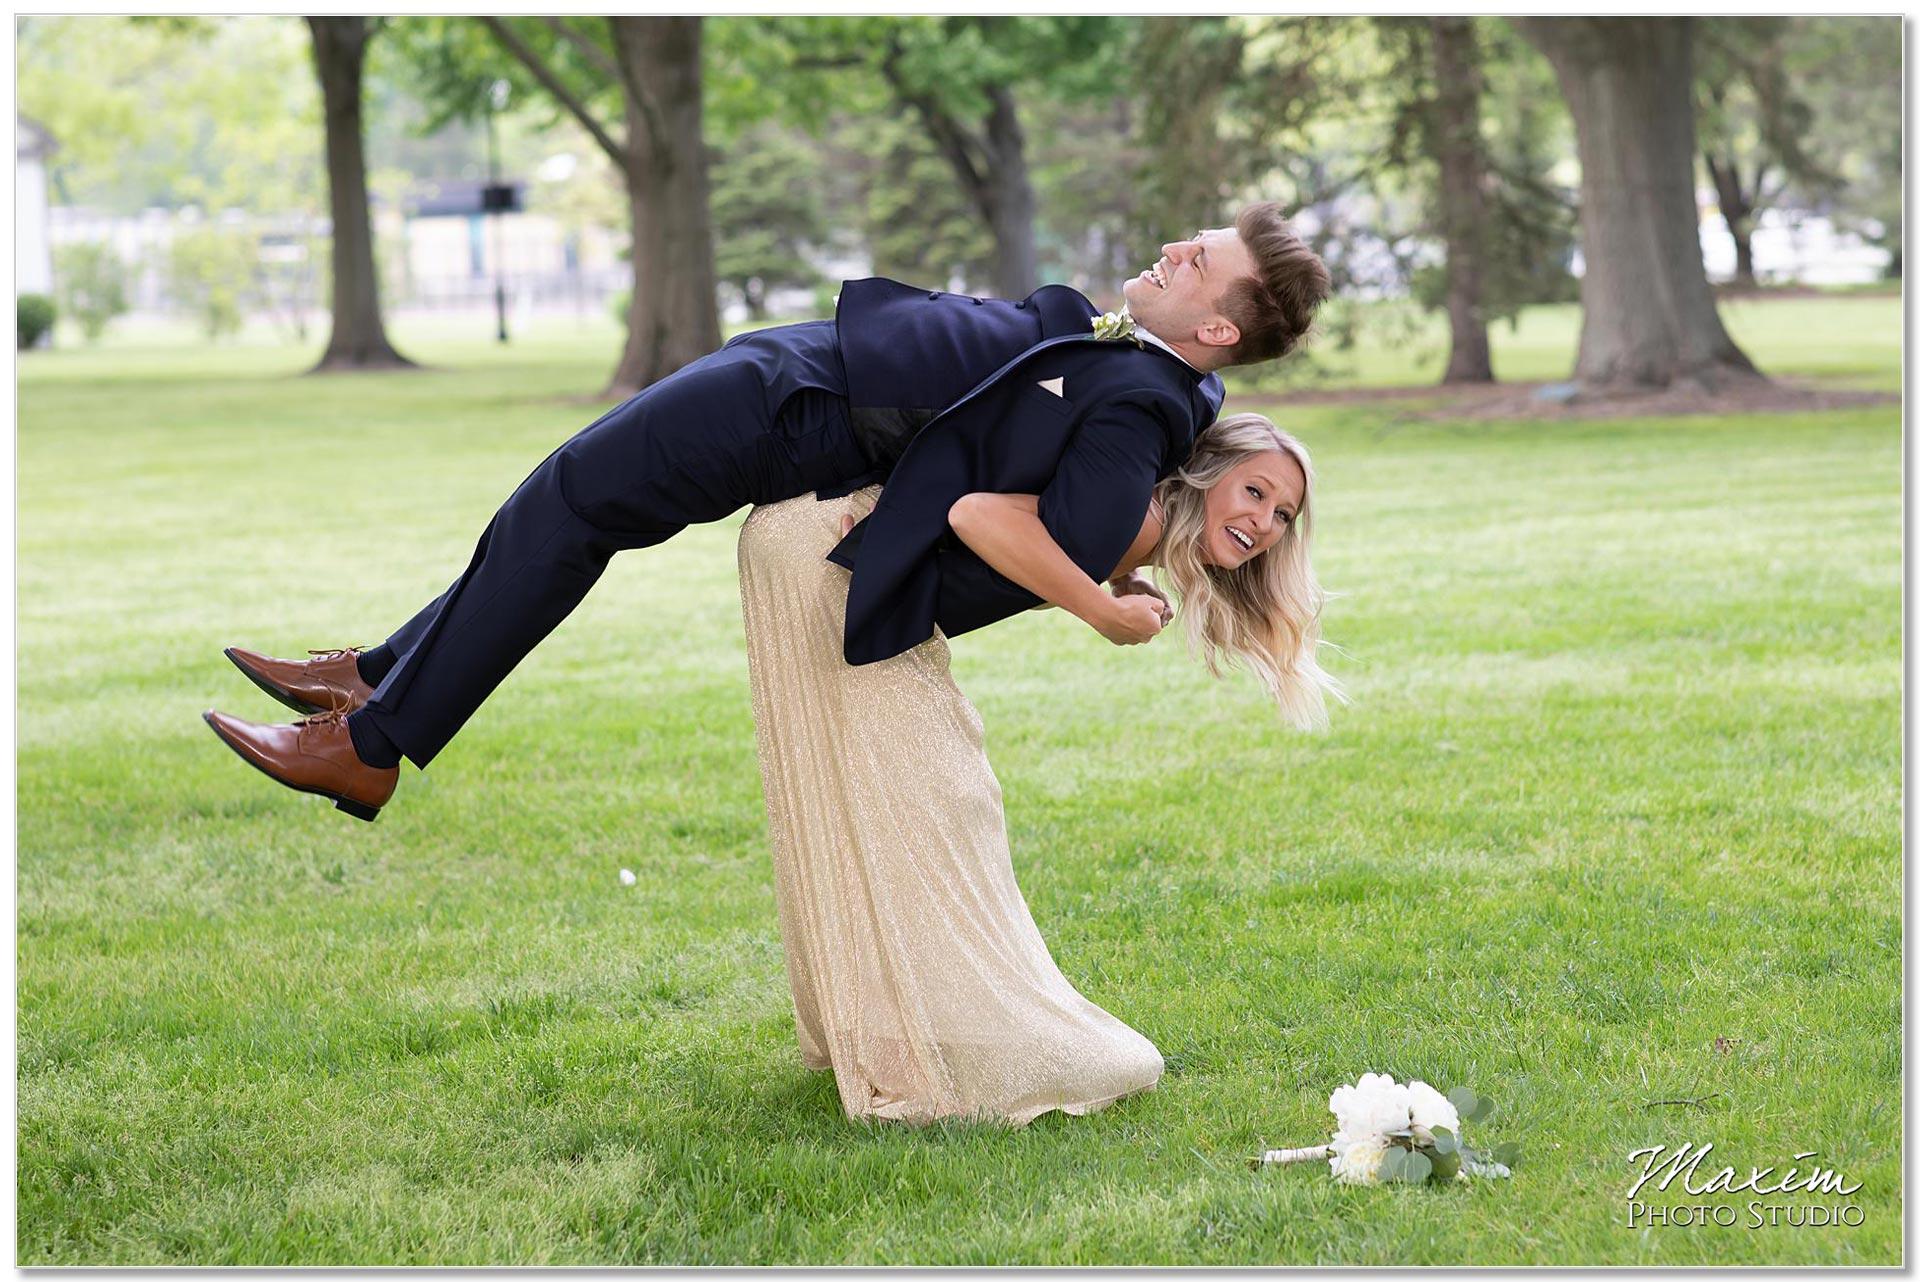 Polen Farm Bridesmaid groomsmen fun pose